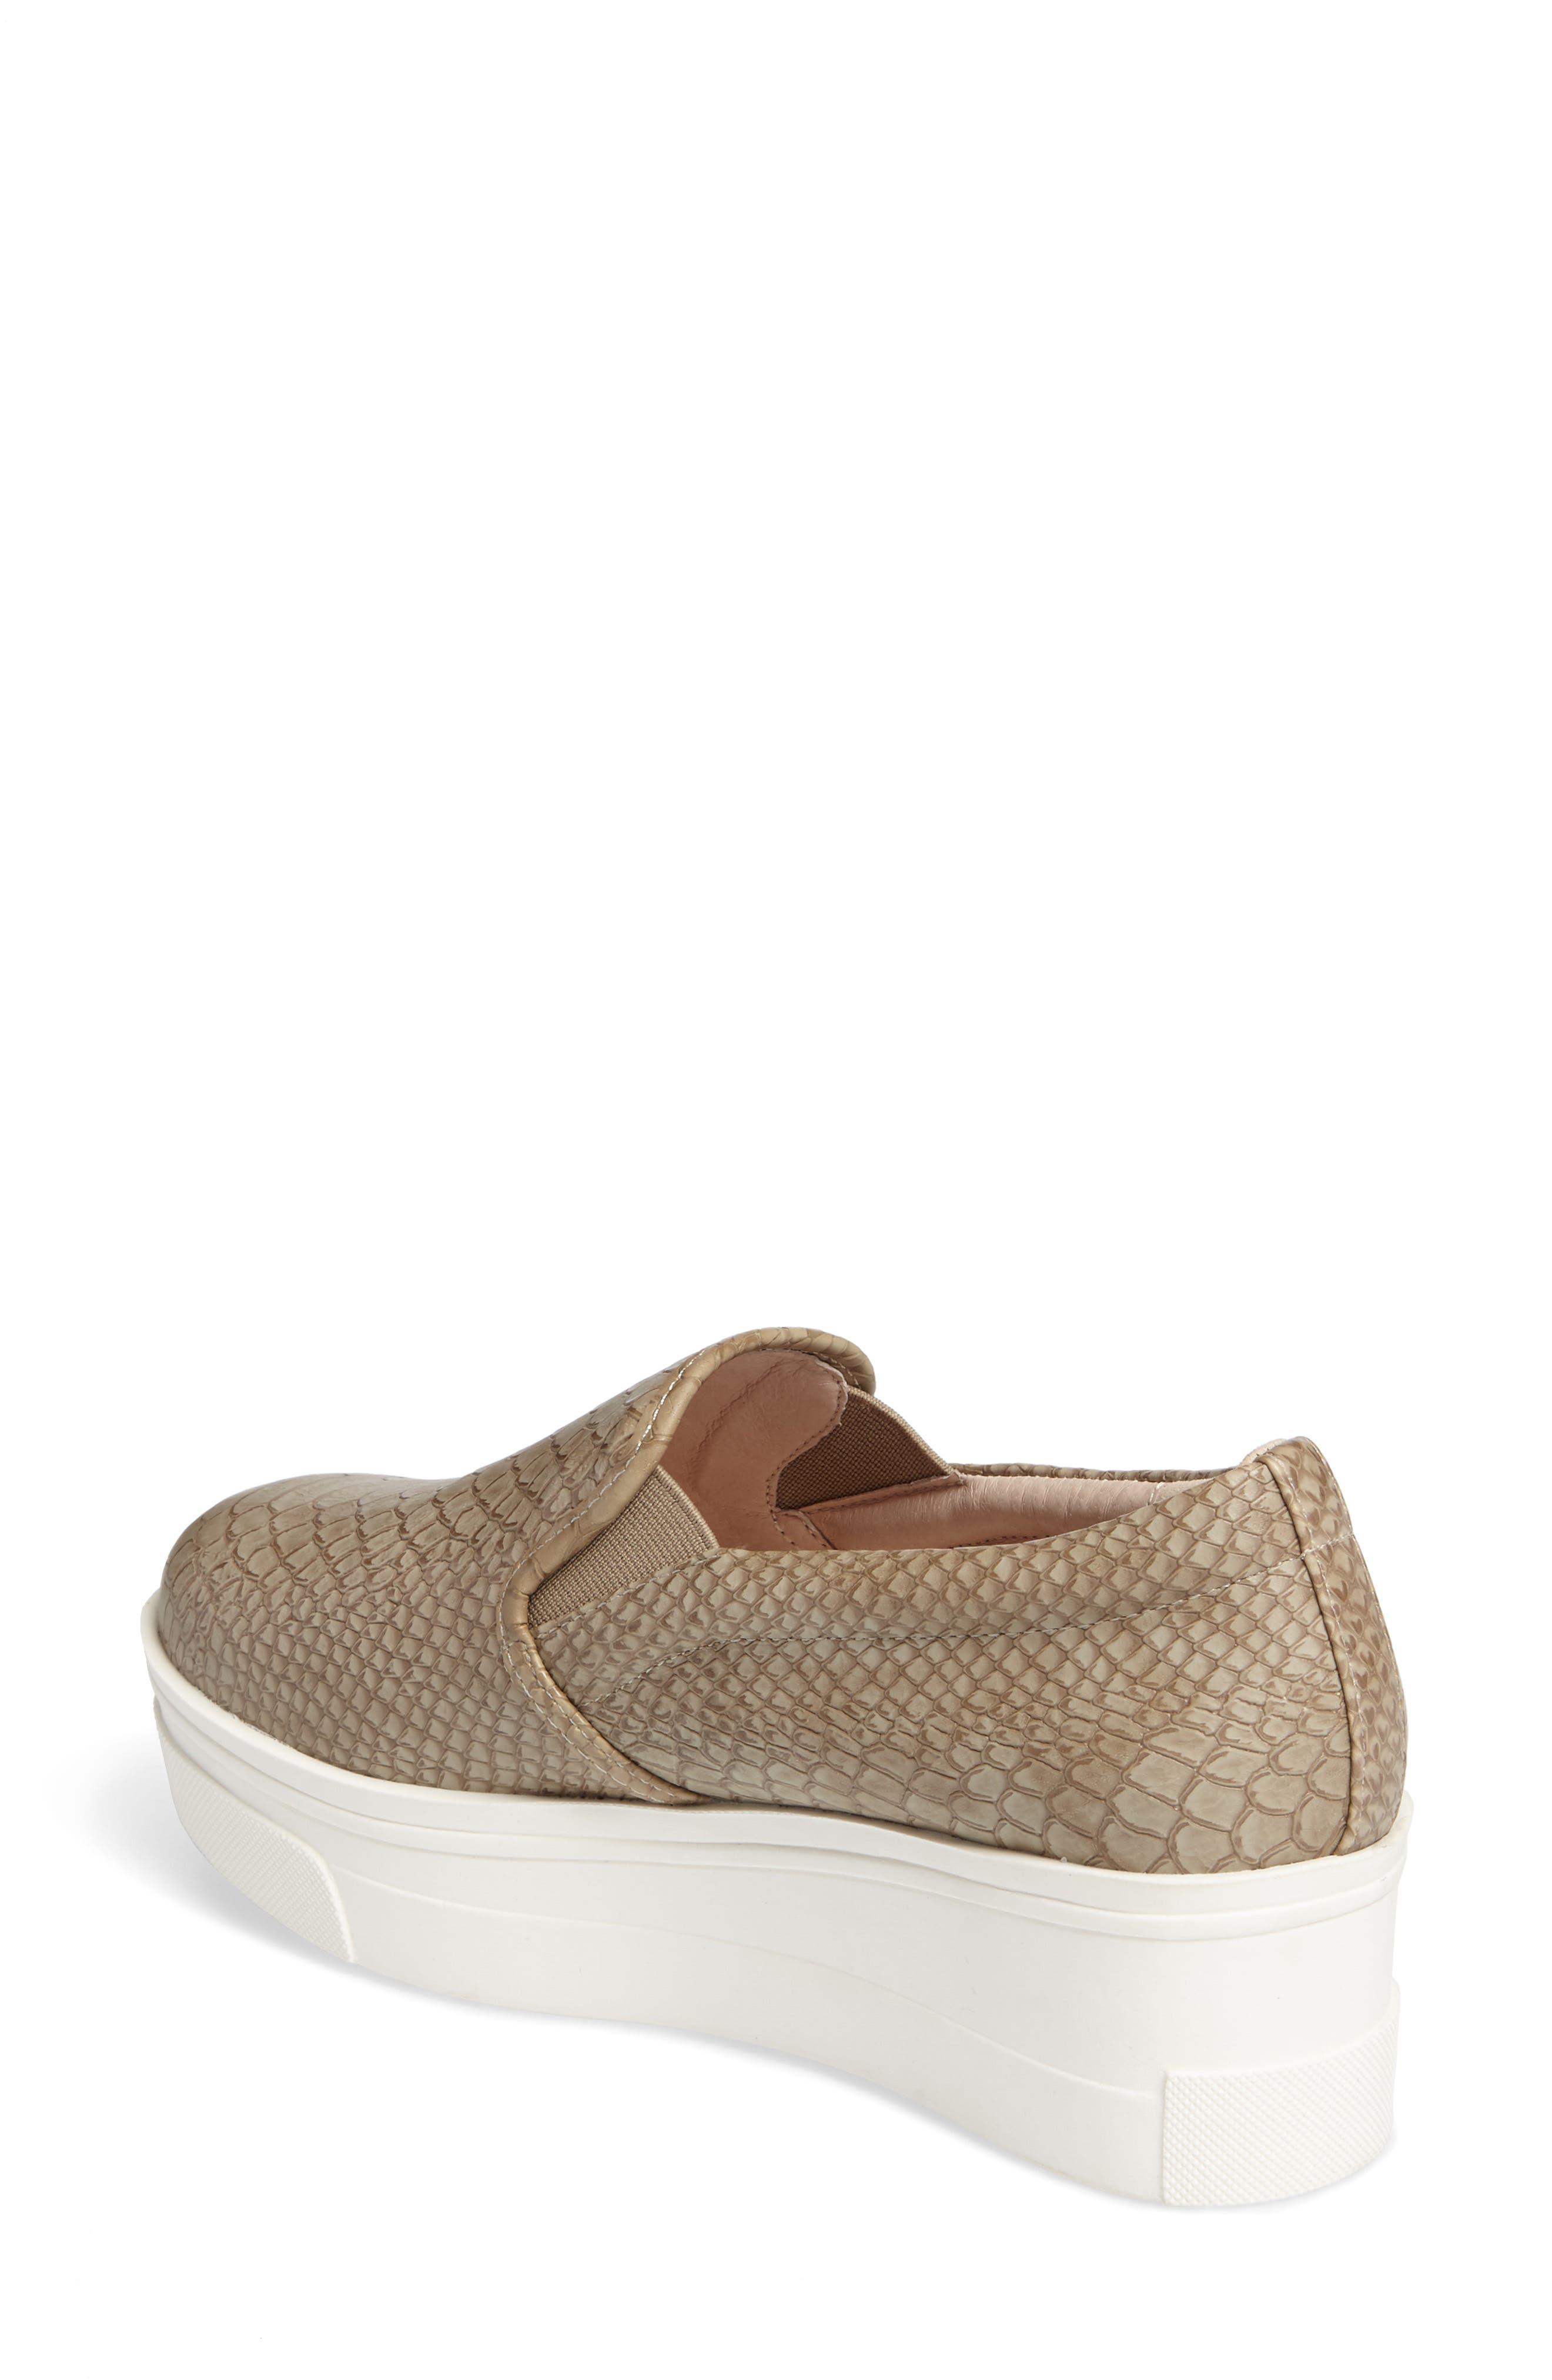 Alternate Image 2  - JSlides Genna Slip-On Sneaker (Women)